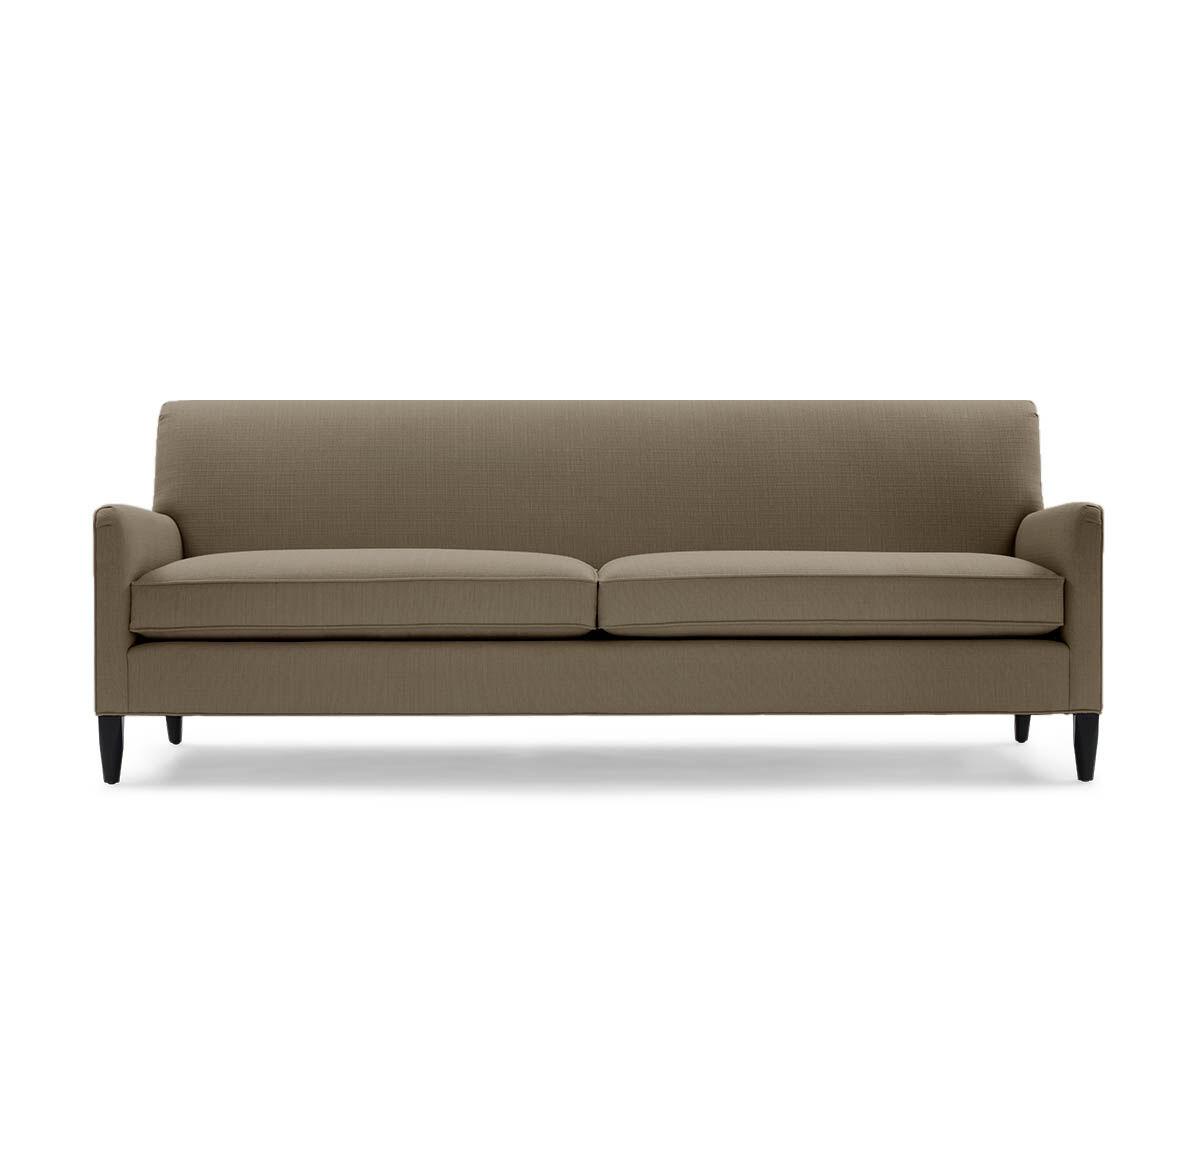 sloane sofa hires